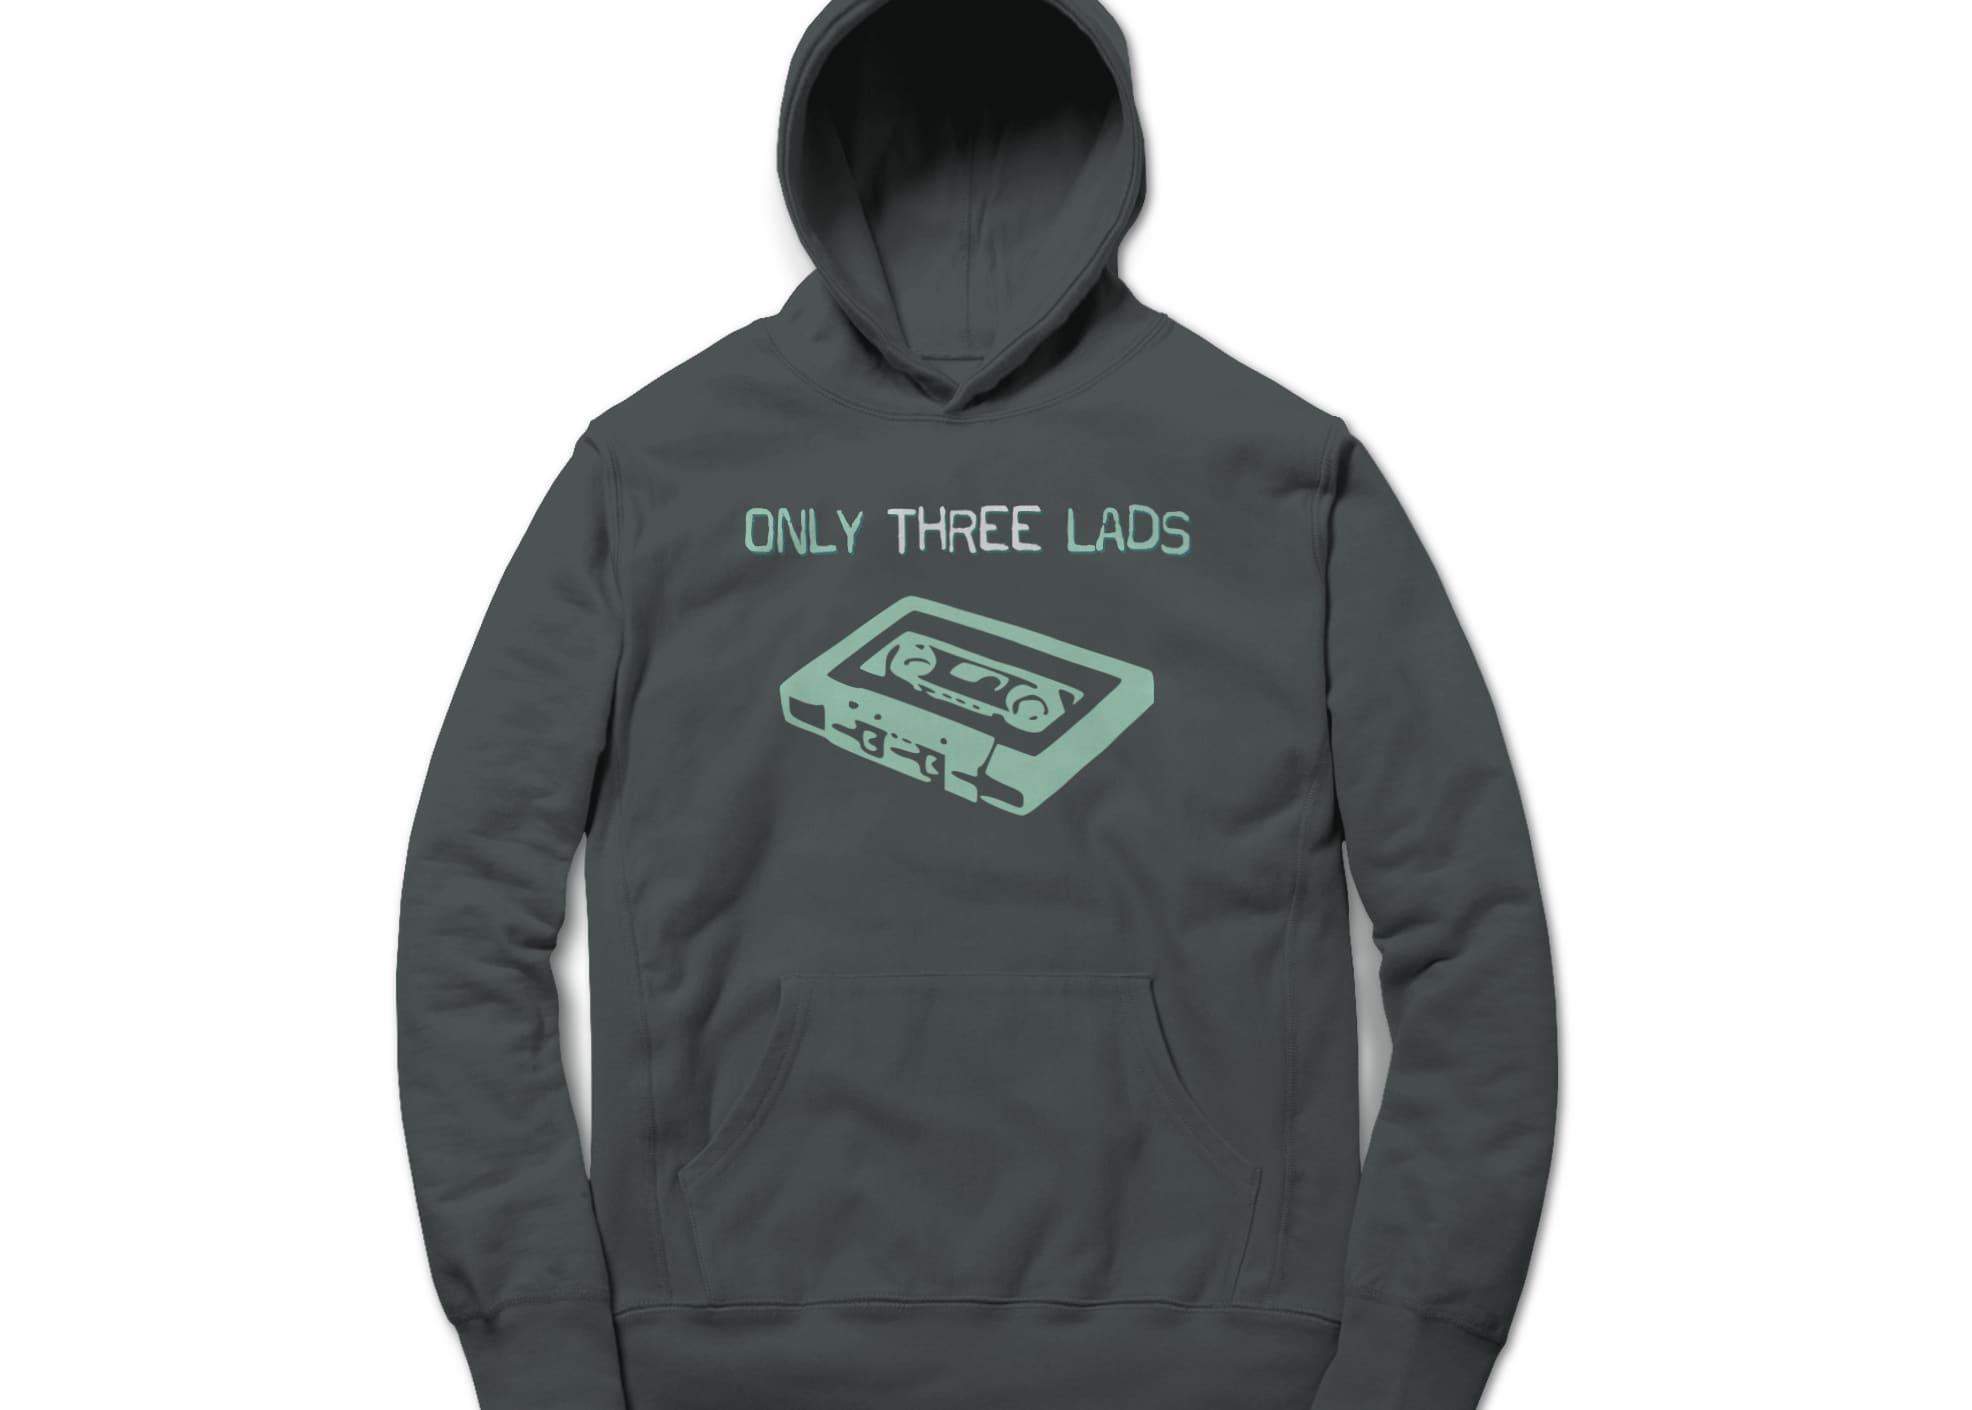 Only three lads o3l   tape  asphalt  1581057024